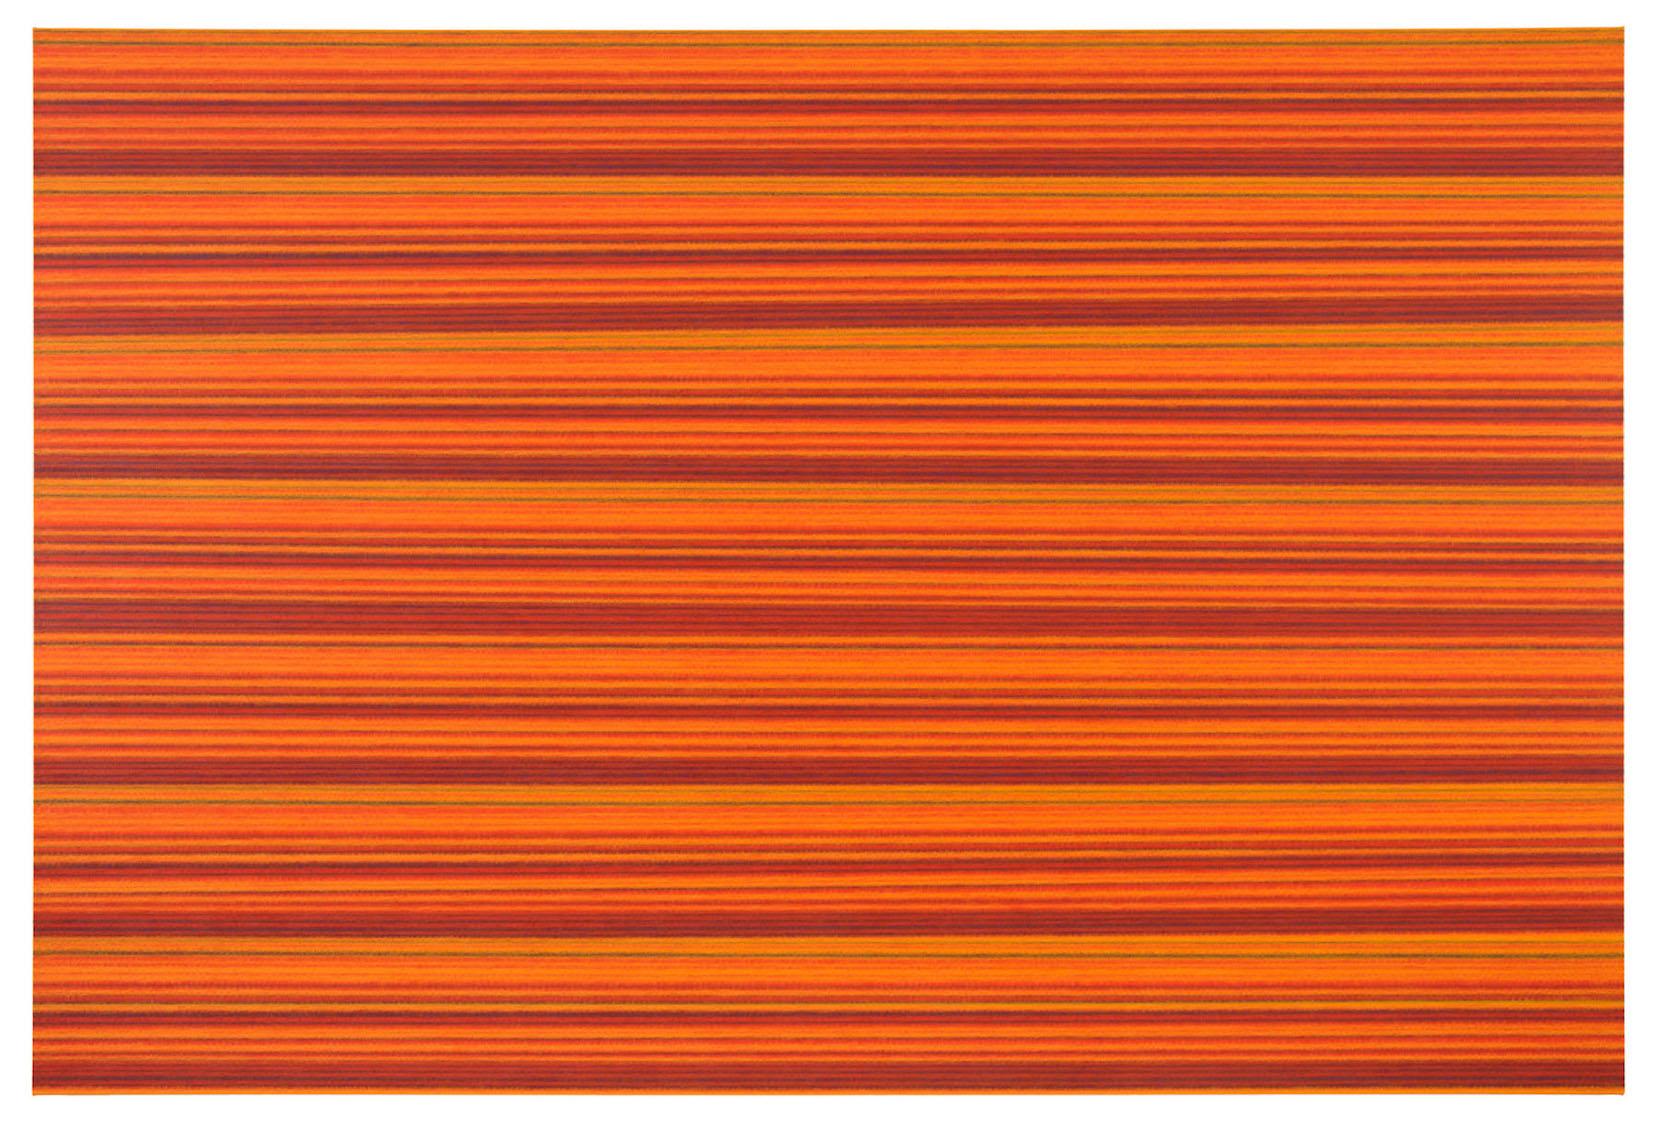 "Rickard Sollman, ""Replik (Uppbrott)"", 2010-11, oil on canvas, 150 x 224 cm"